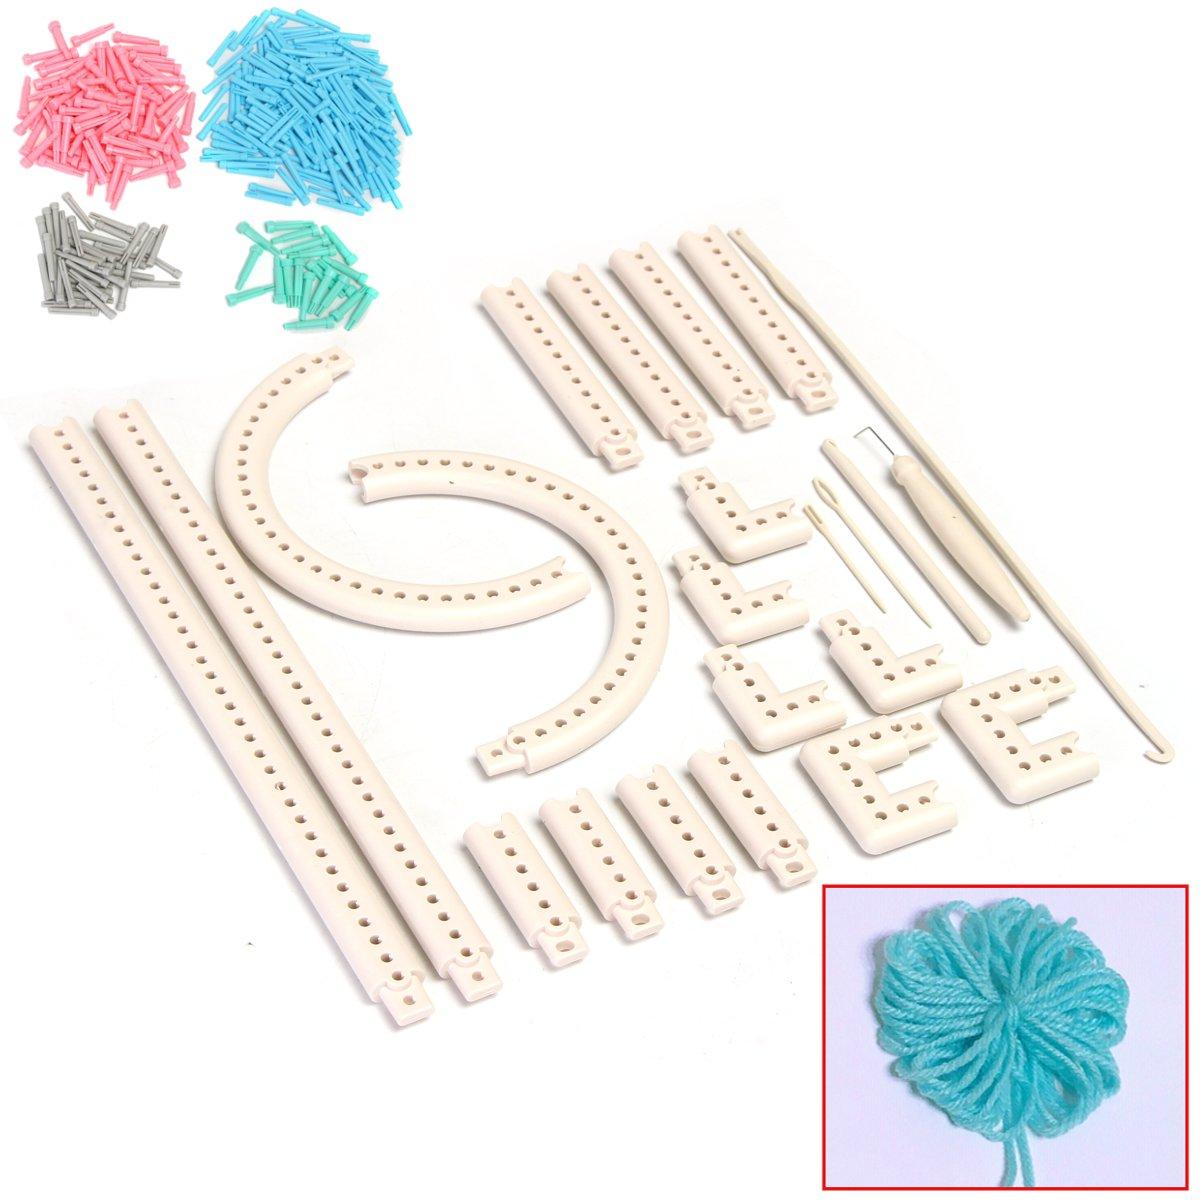 5000-100 Knitting Multi-function Knitting Board Knit&Weave Loom Craft Yarn Kit DIY Scarf Sweater